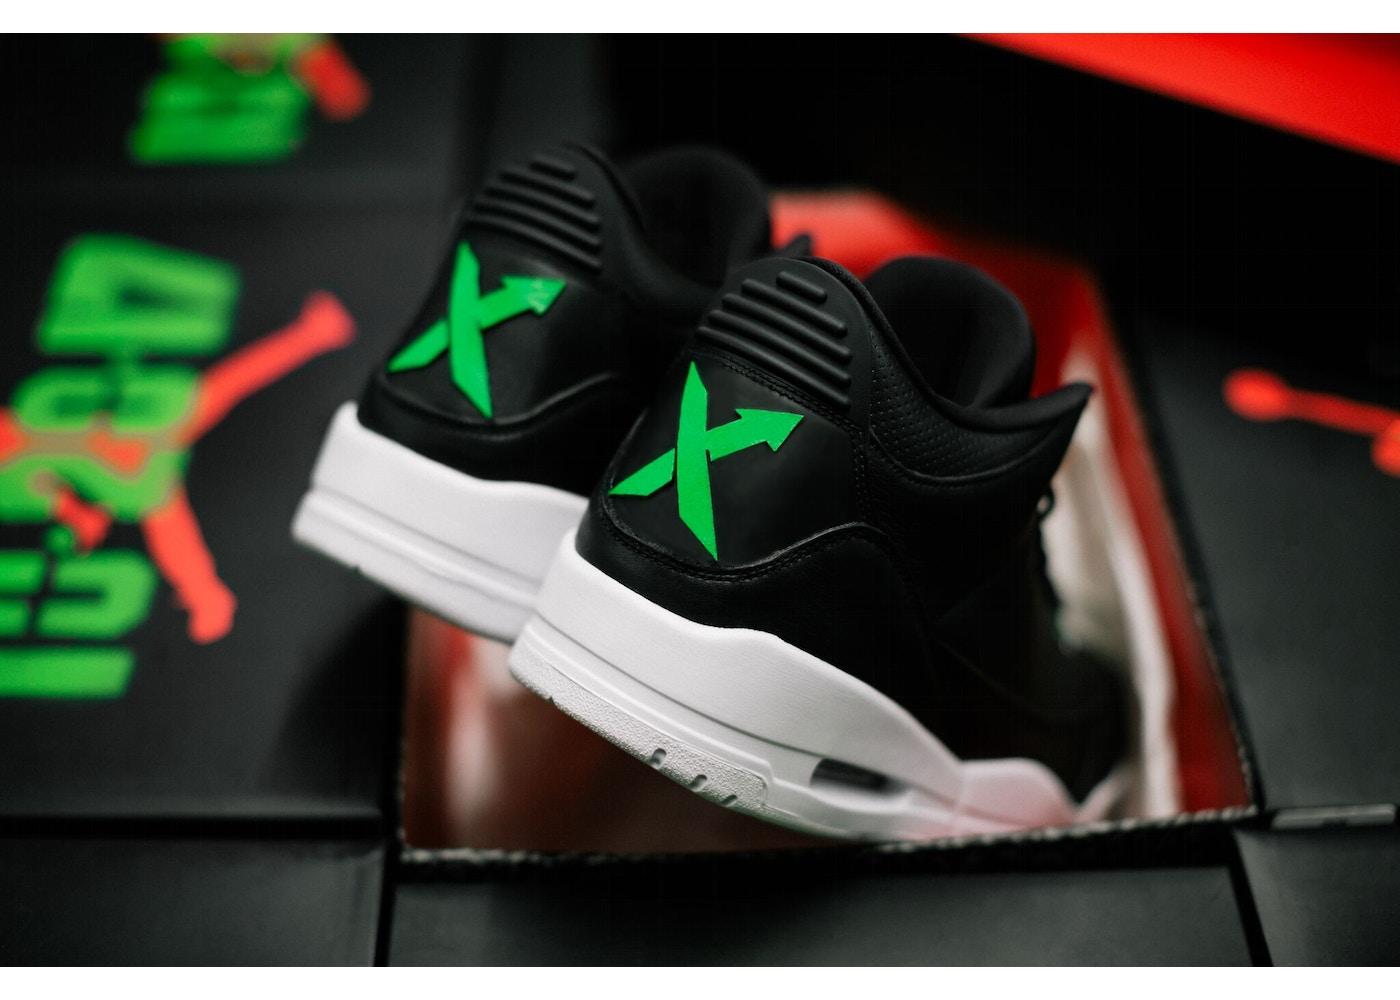 85844447068f Air Jordan 3 Size 7.5 Shoes - Release Date